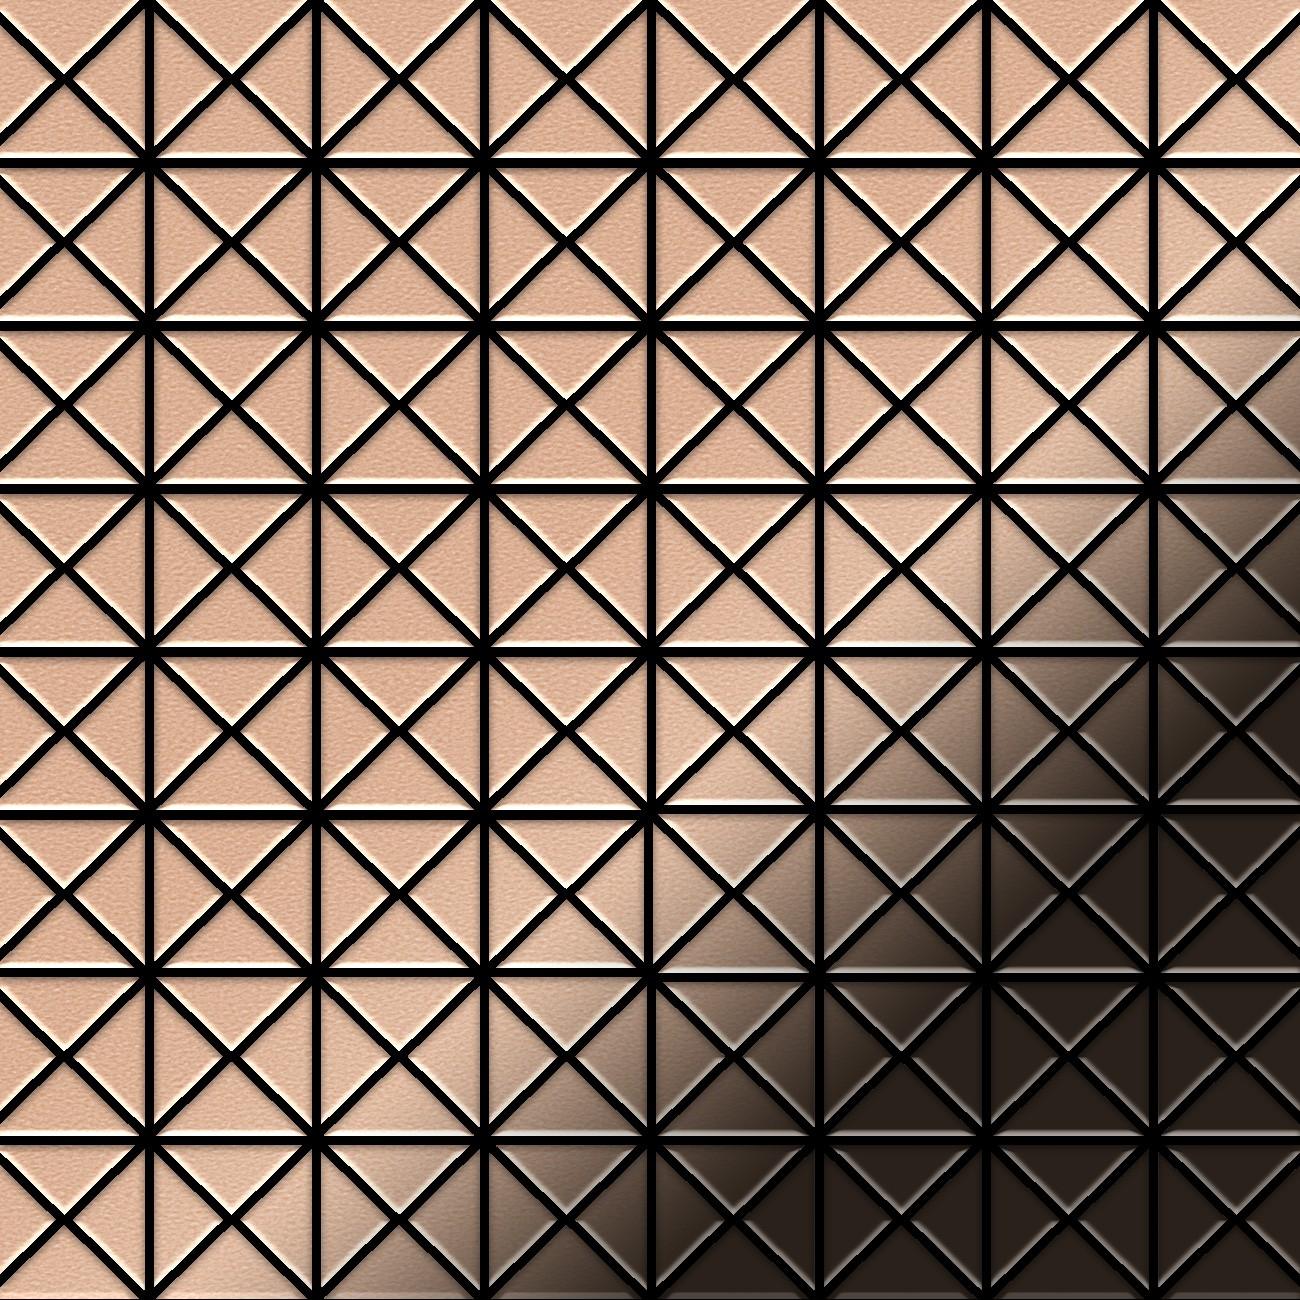 mosaik fliese massiv metall kupfer gewalzt kupfer 1 6mm stark deco cm ebay. Black Bedroom Furniture Sets. Home Design Ideas